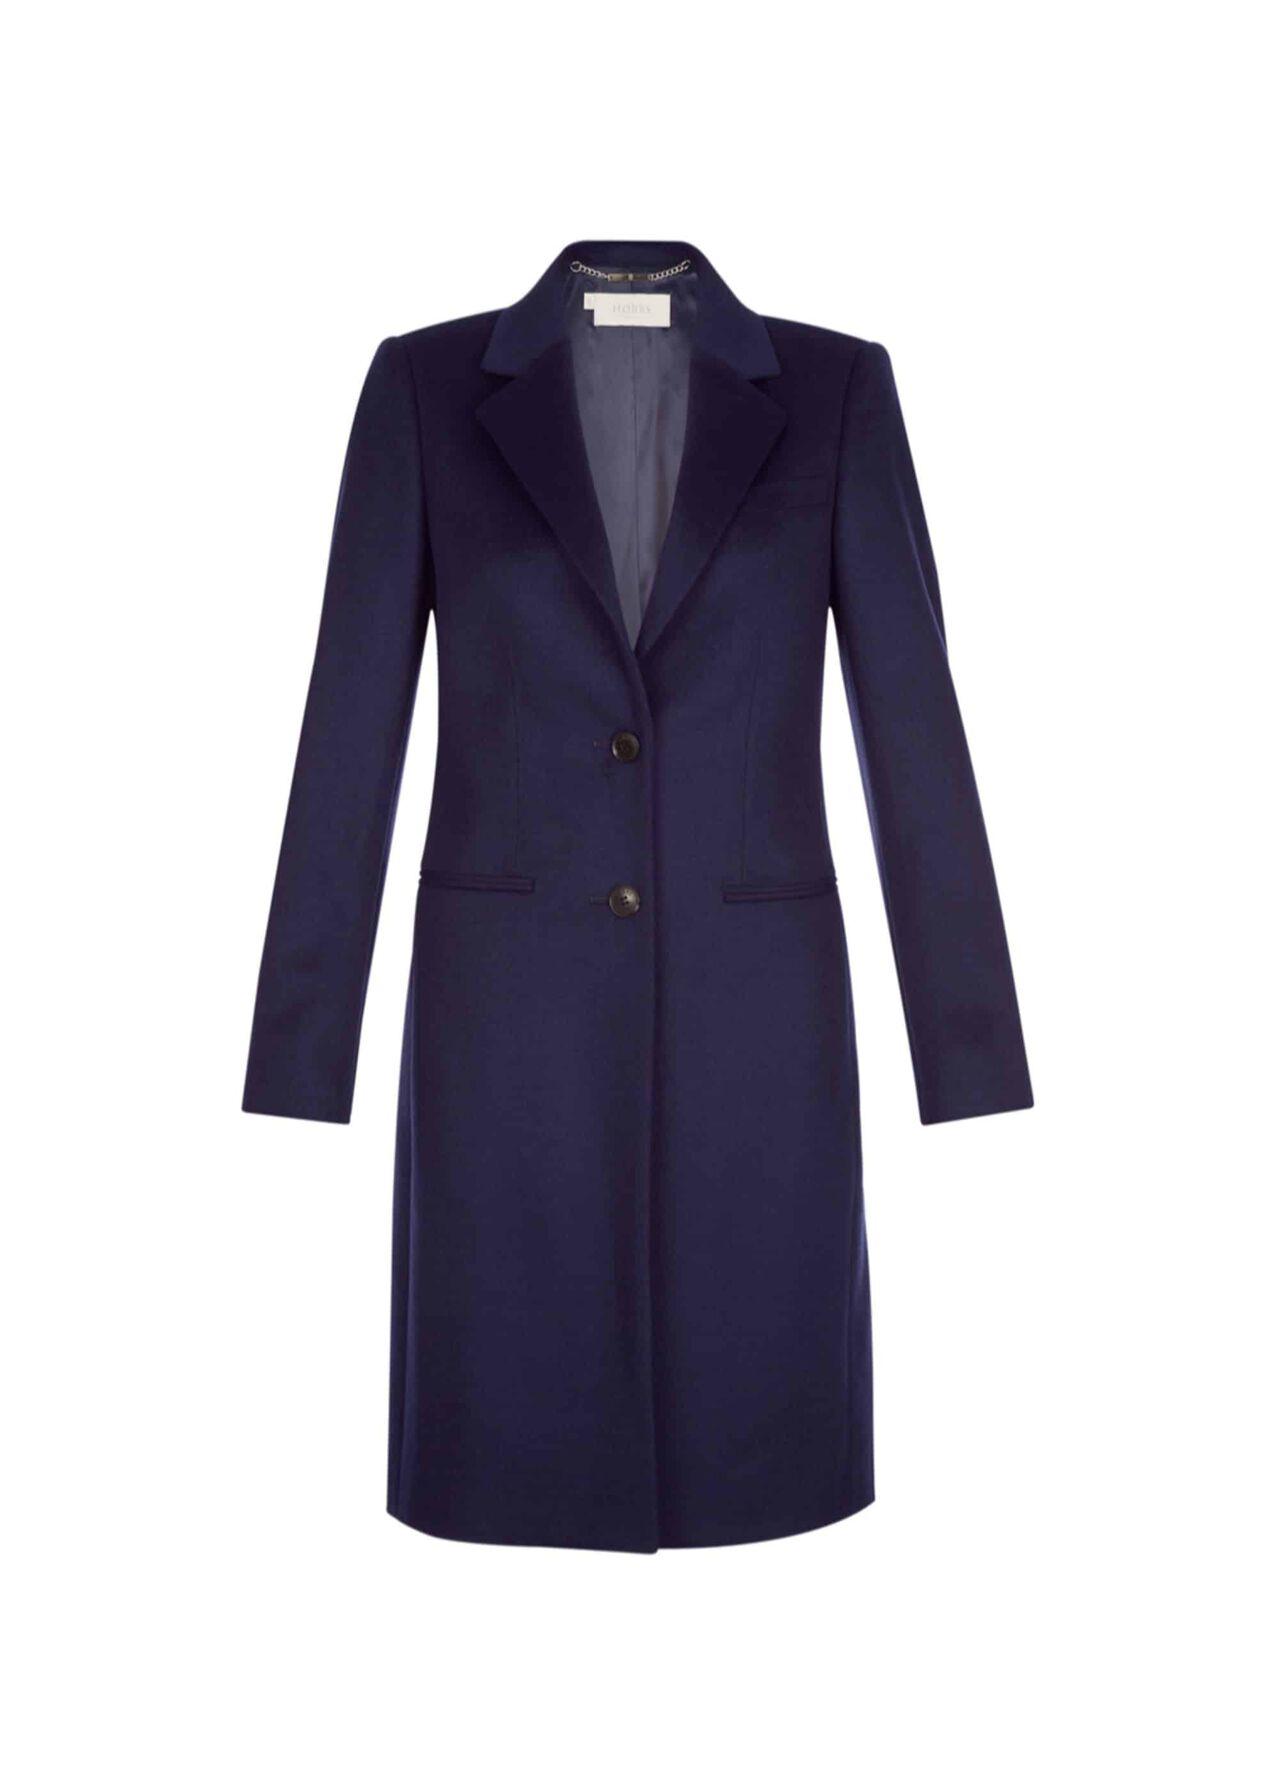 Petite Tilda Wool Coat French Navy